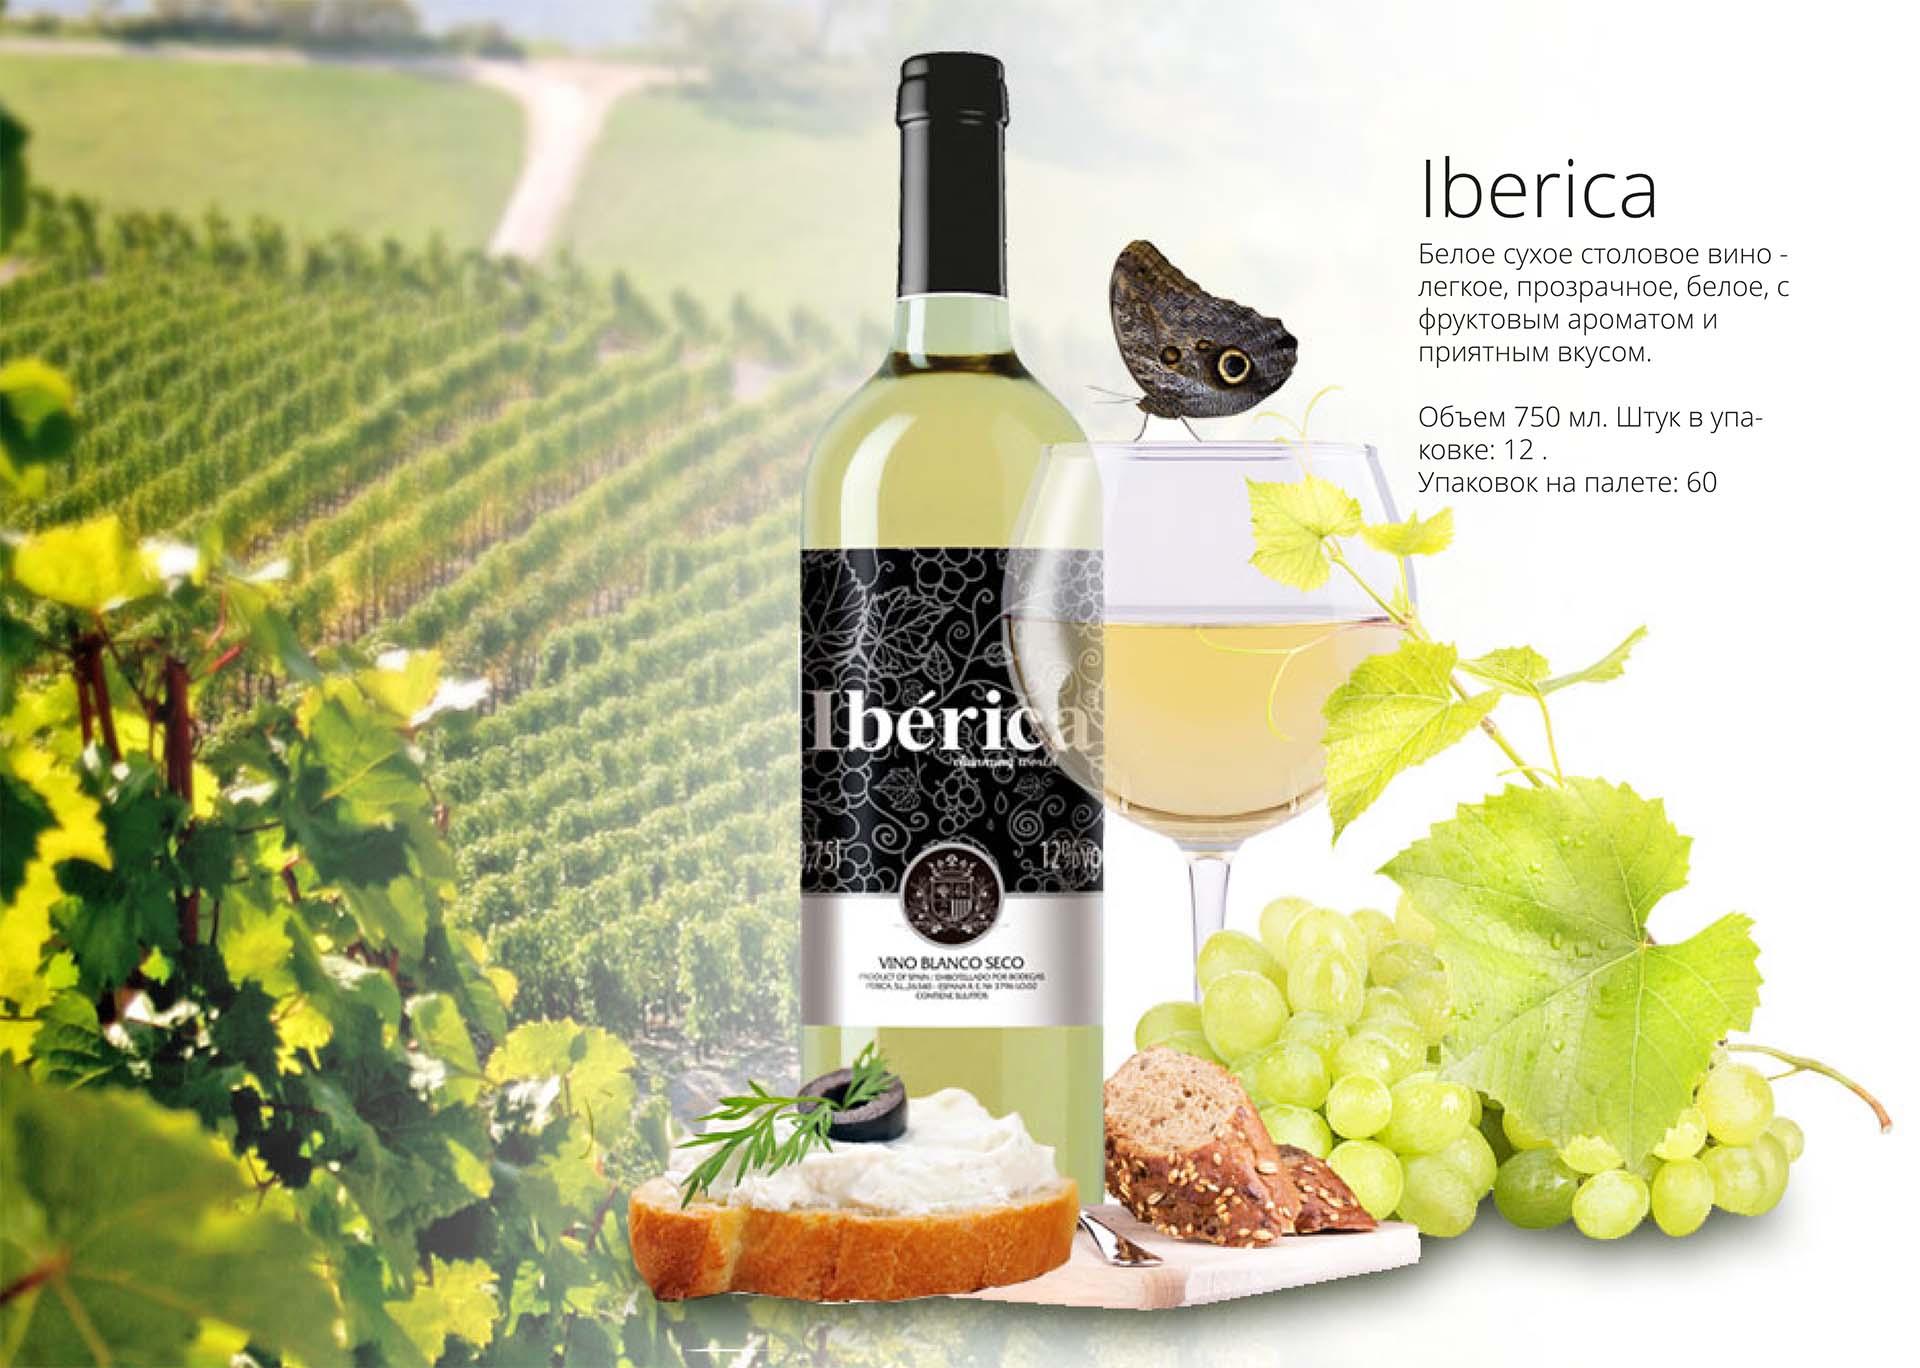 Iberica Catalogo de Vino 7